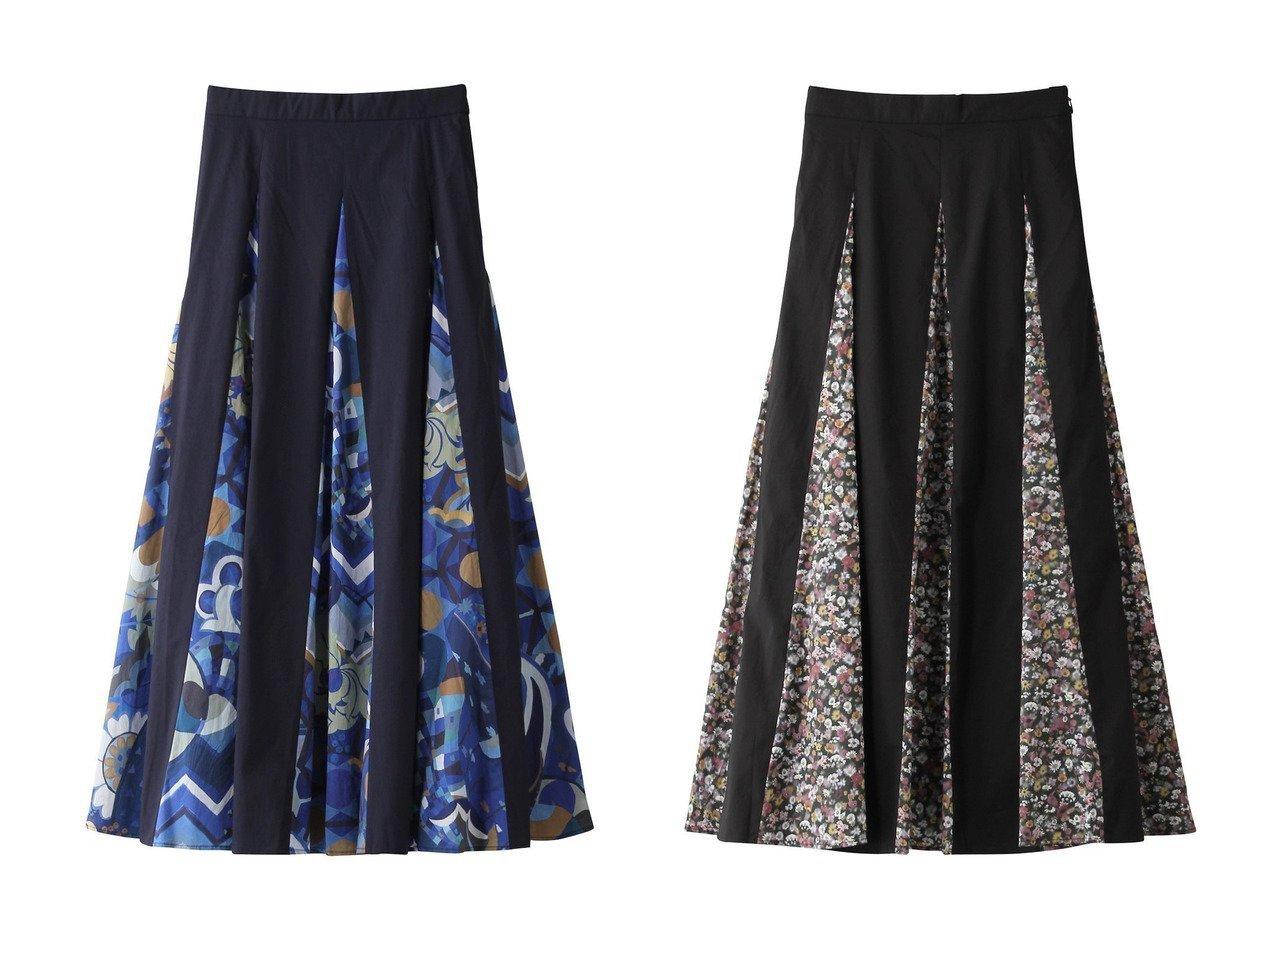 【ROSE BUD/ローズバッド】の【PRINT MANIA】オリエンタルプリント切替ロングスカート&【PRINT MANIA】フラワープリント切替ロングスカート 【スカート】おすすめ!人気、トレンド・レディースファッションの通販 おすすめで人気の流行・トレンド、ファッションの通販商品 インテリア・家具・メンズファッション・キッズファッション・レディースファッション・服の通販 founy(ファニー) https://founy.com/ ファッション Fashion レディースファッション WOMEN スカート Skirt ロングスカート Long Skirt オリエンタル コンビ プリント ロング 切替 無地 |ID:crp329100000069143